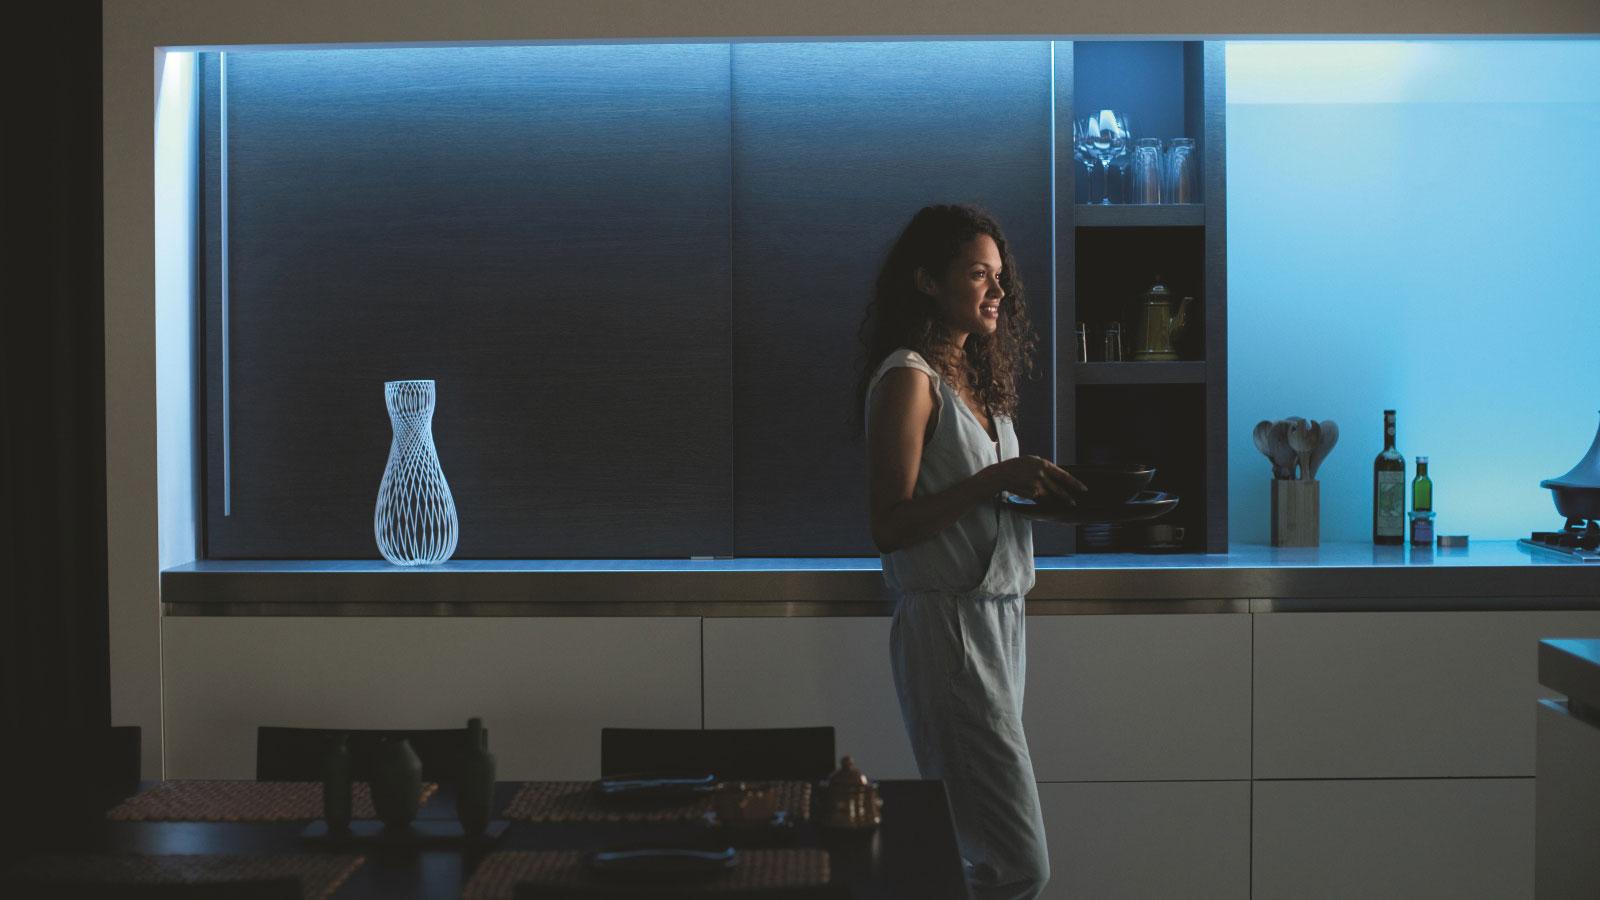 Hue Lightstrips Plus können dezente Farbakzente setzen